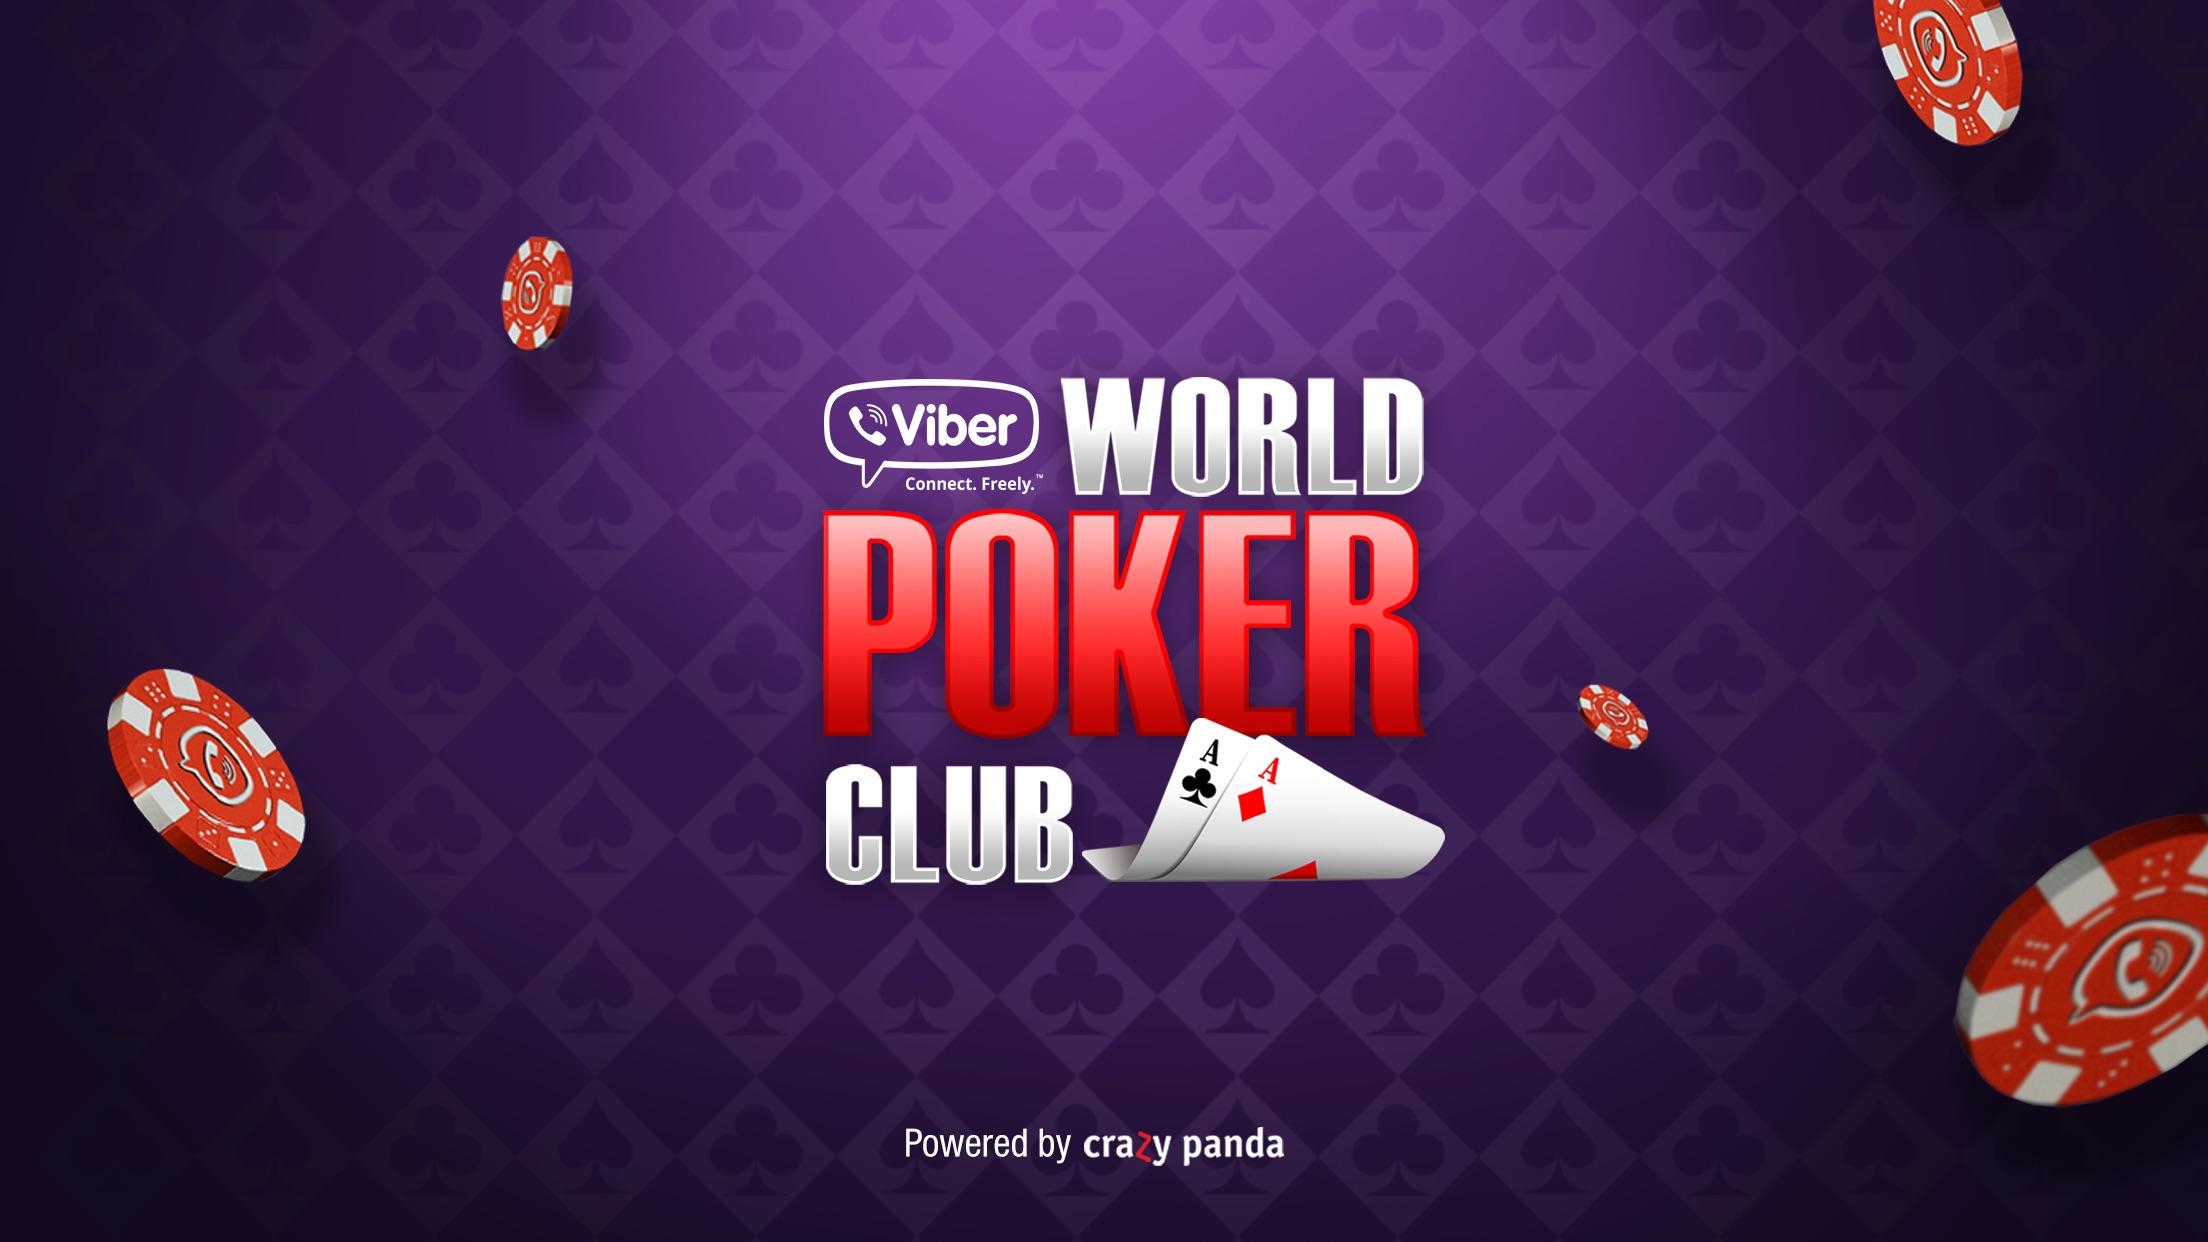 Viber World Poker Club Screenshot